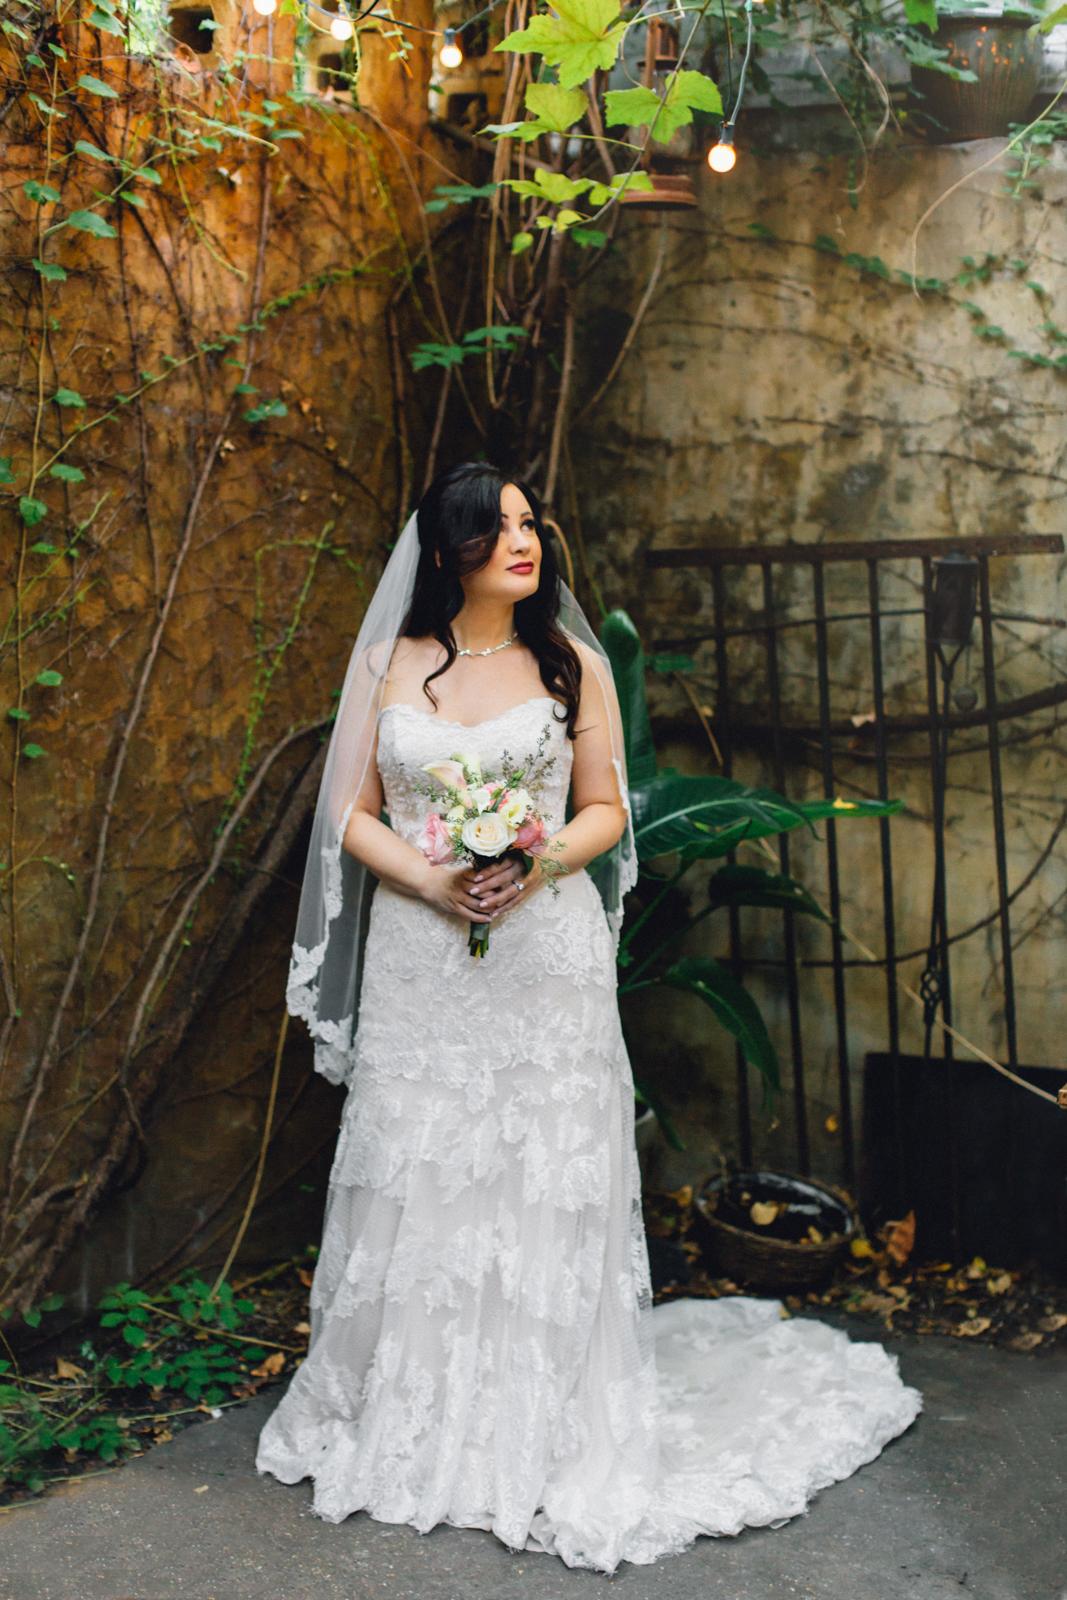 NYC Wedding Photography Lofts at Prince Brooklyn NYC Photographer Boris Zaretsky _B2C0433-Edit.jpg